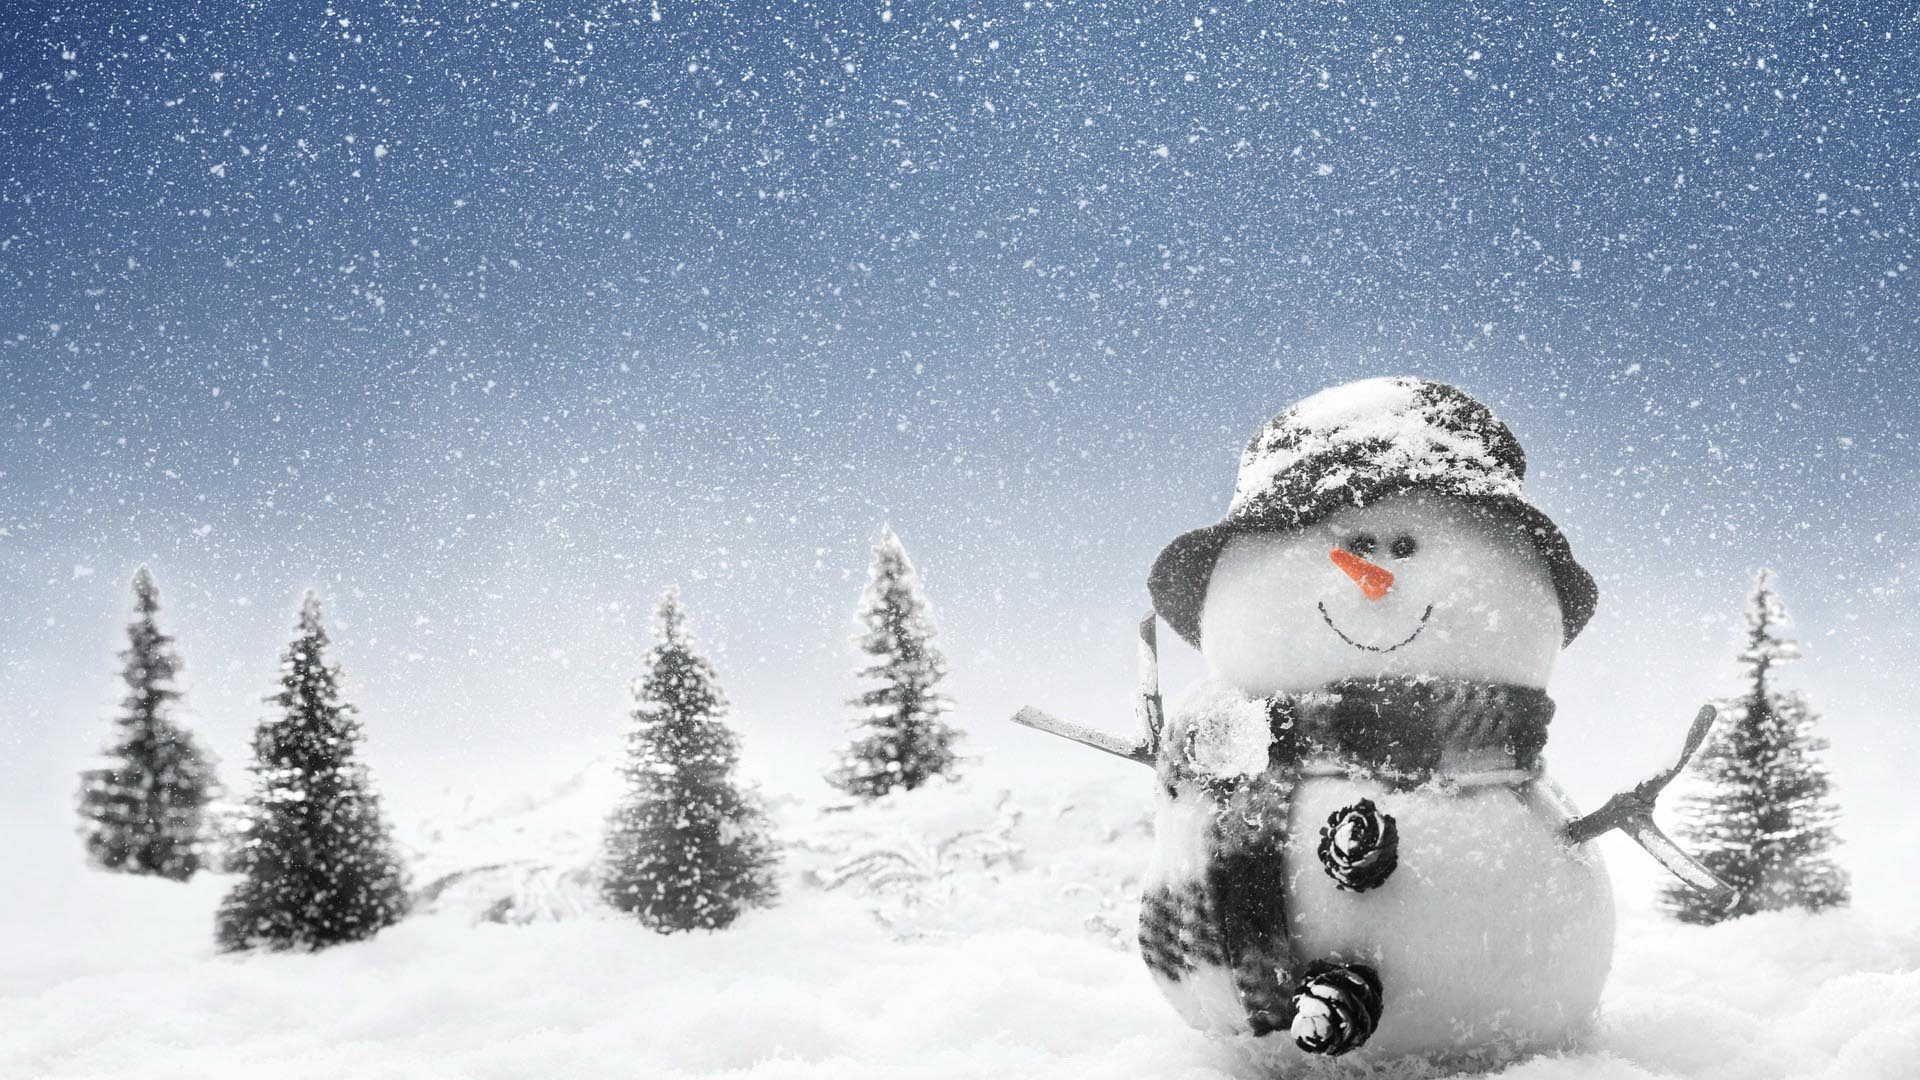 Креативные анимационные картинки зима